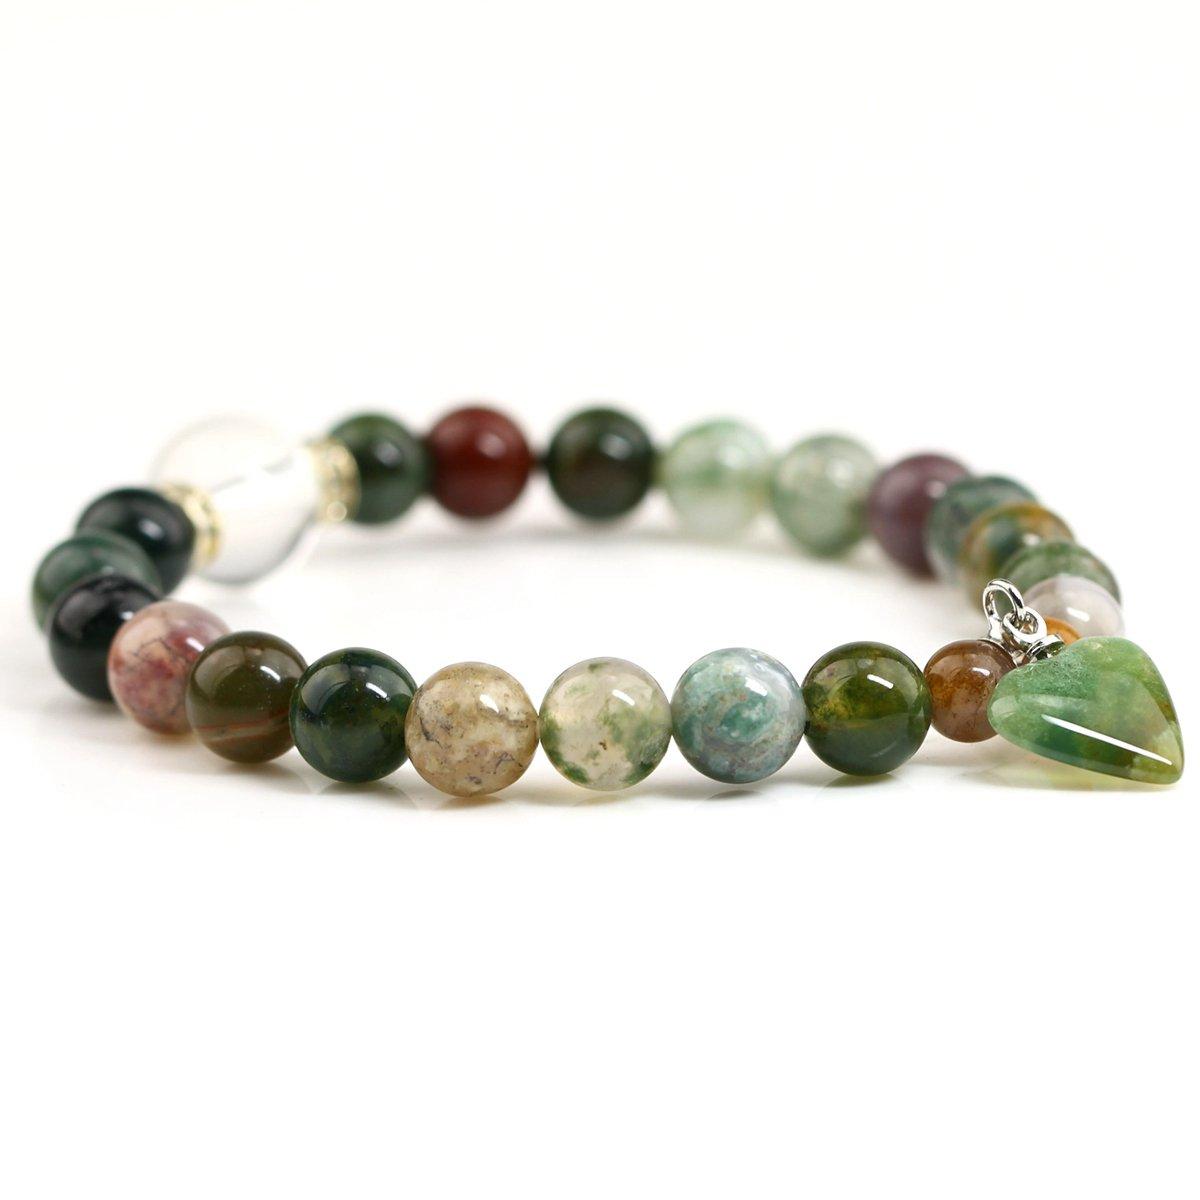 Hand Made Gemstone Healing Natural Jasper Crystals Chakra Bangel Elastic with Heart Pendant Bracelet (Amethyst) Baixiyan